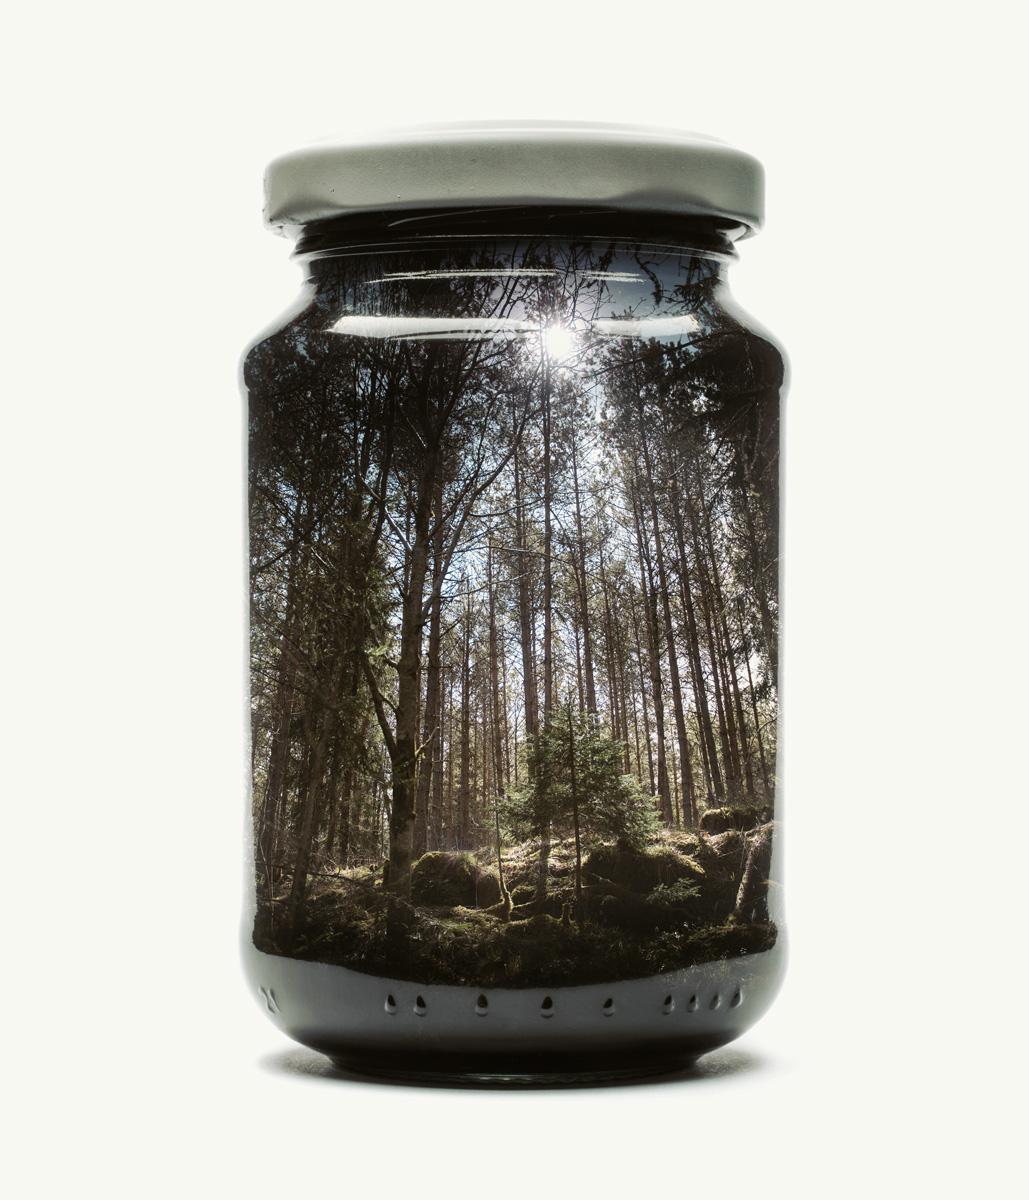 double exposure multiple exposure in-camera finland Nature jar mason jar childhood nostalgia dslr